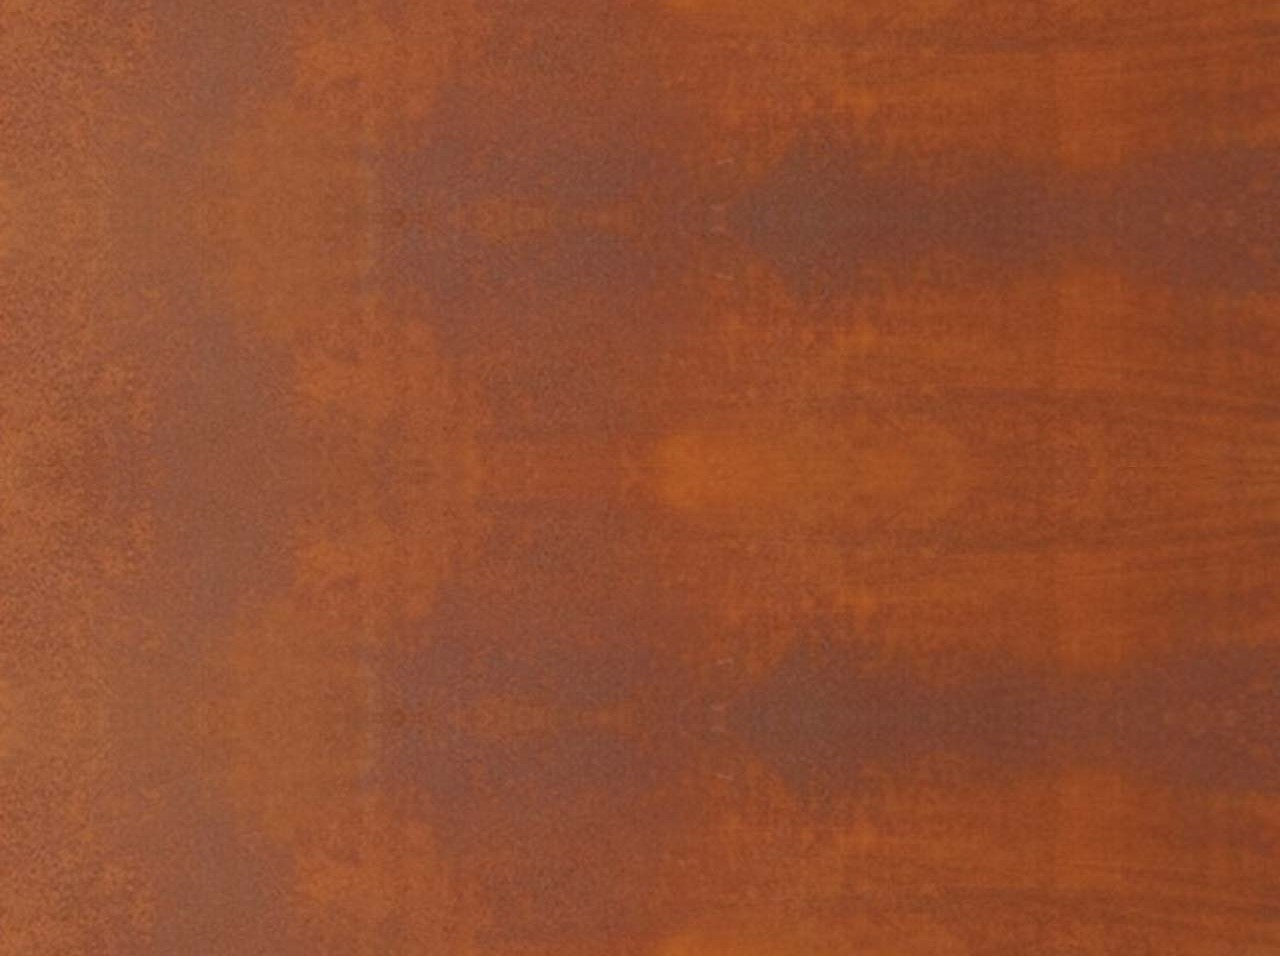 La corrosion galvanique, explications et solutions